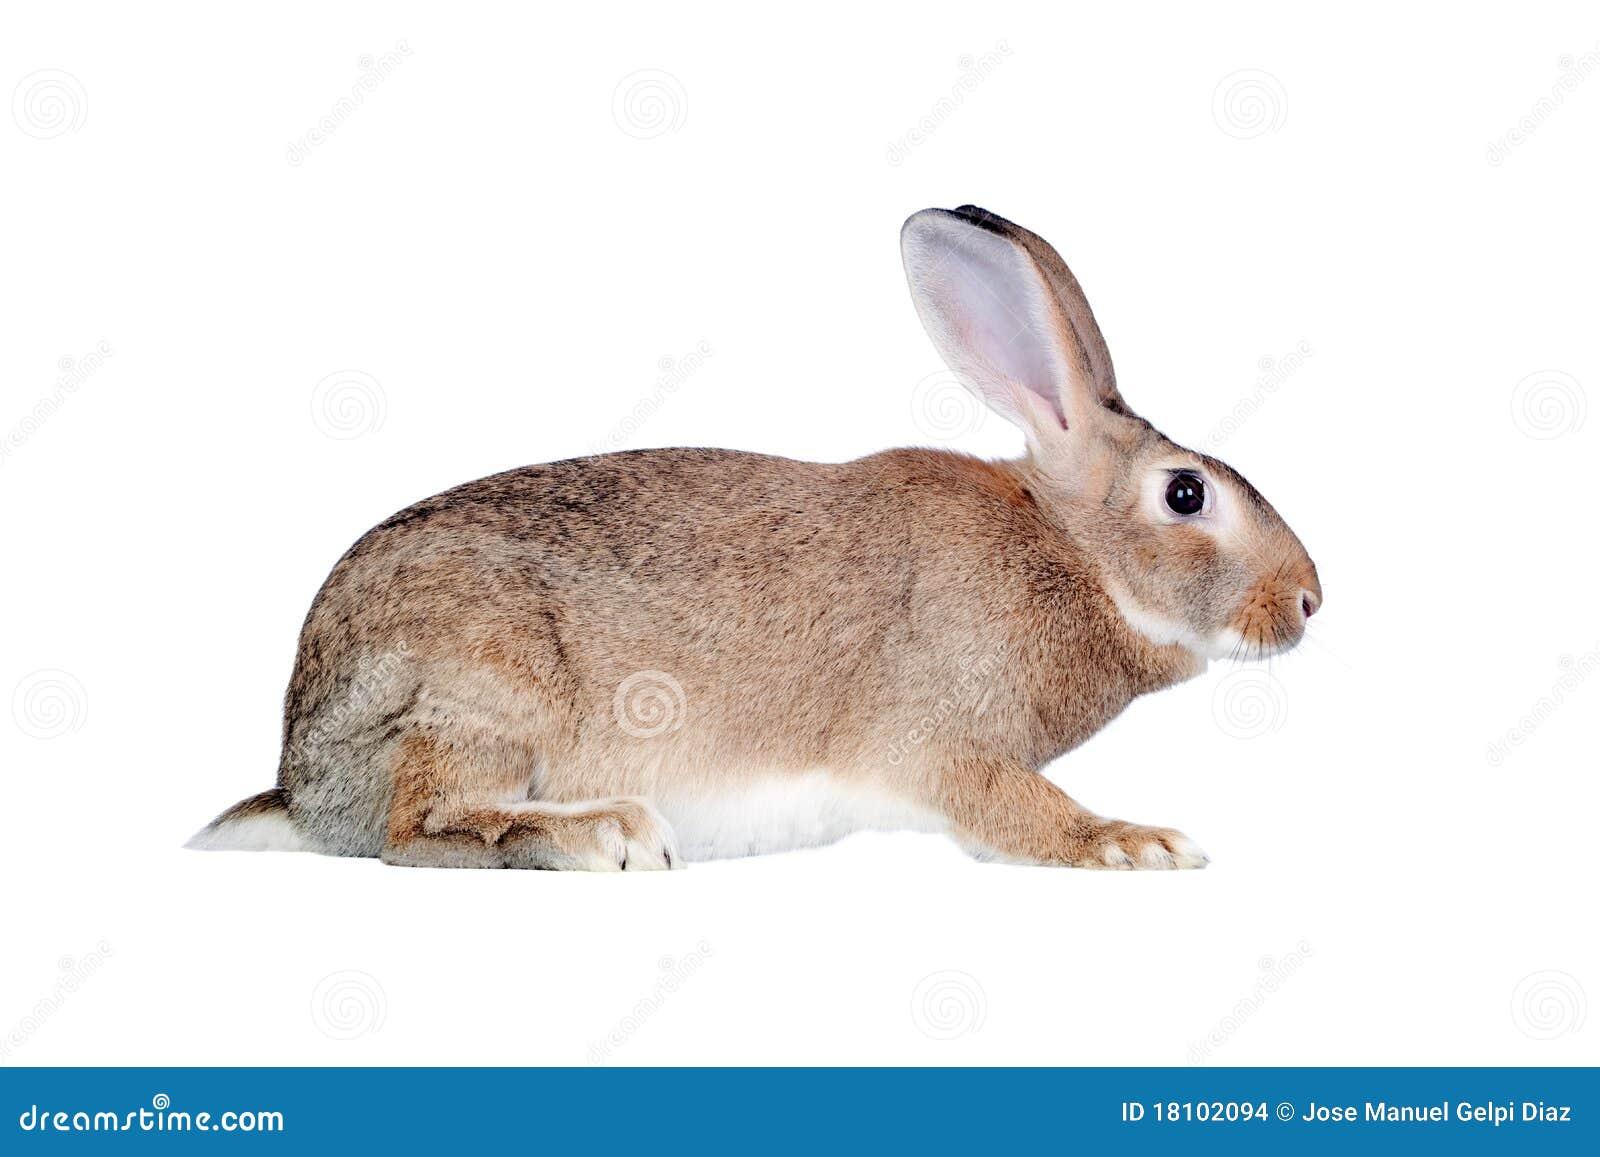 Nice brown bunny stock images image 18102094